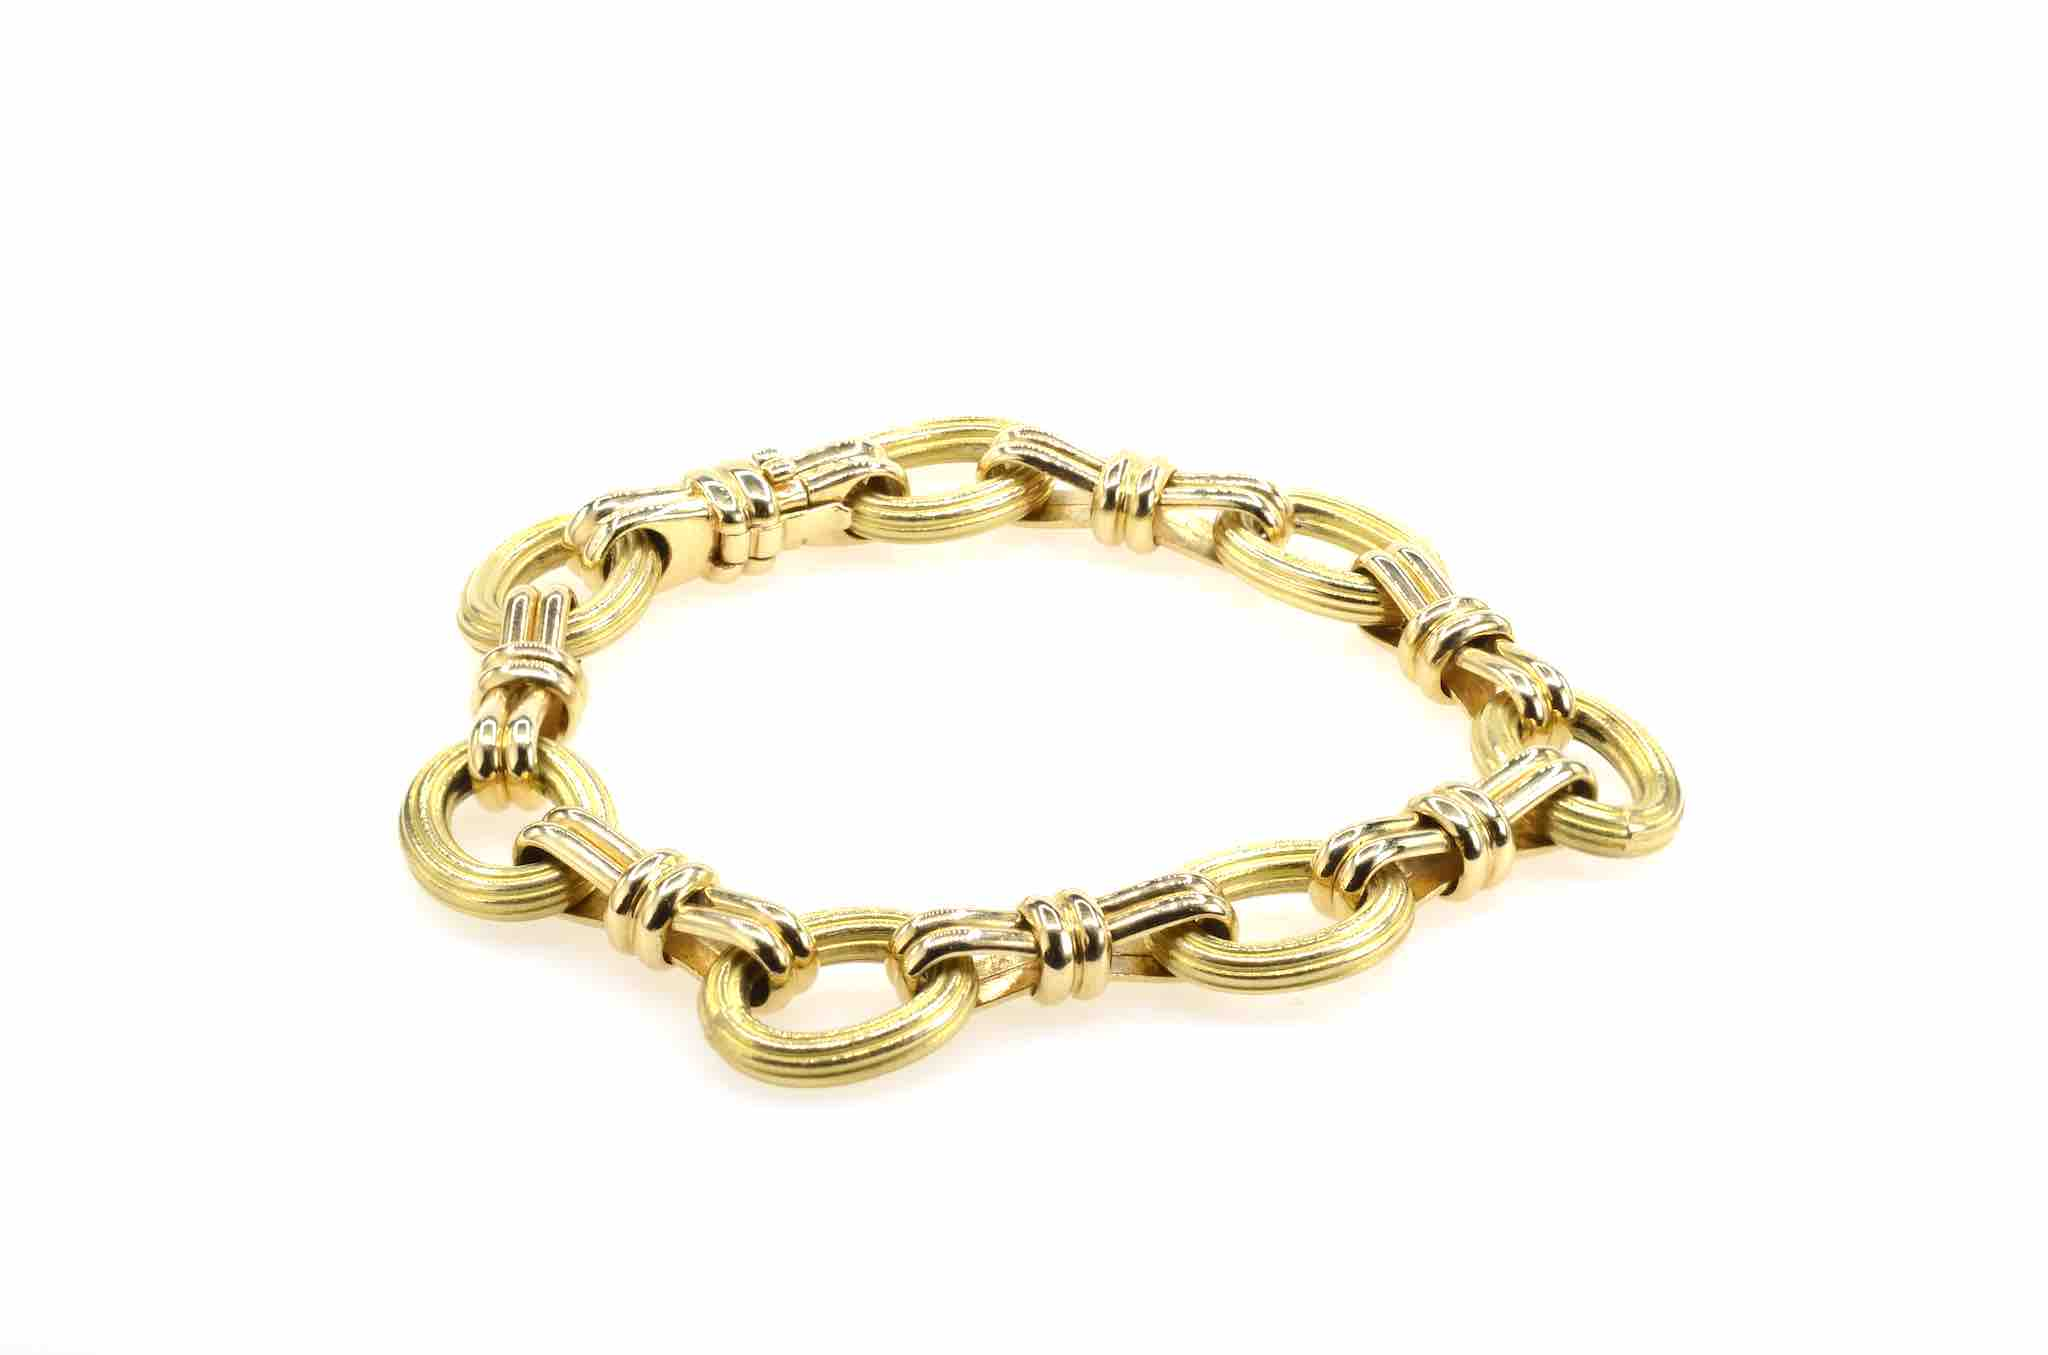 Bracelet Chaumet vintage